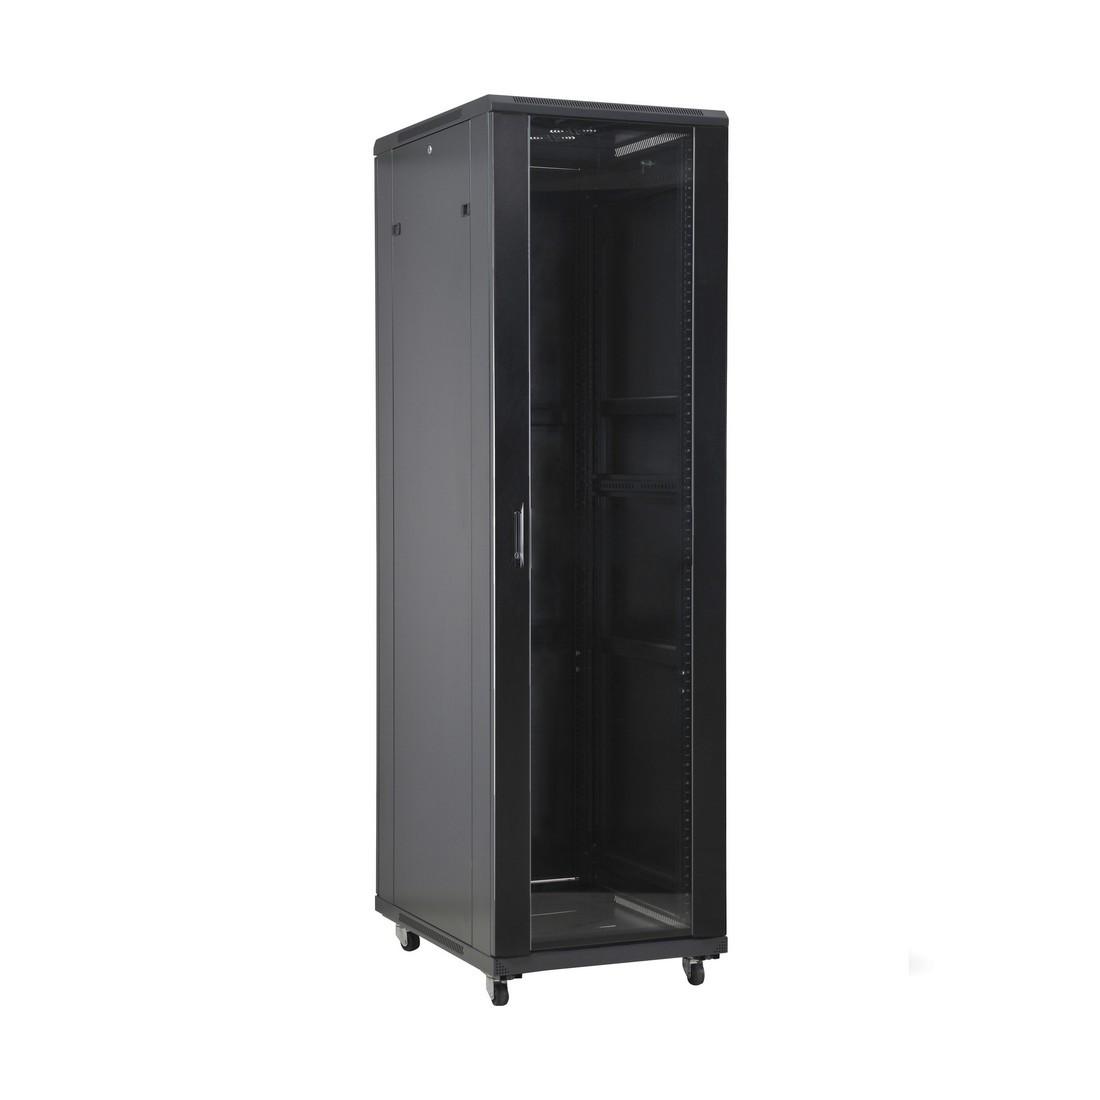 Шкаф серверный SHIP 601S.6624.03.100 24U 600*600*1200 мм